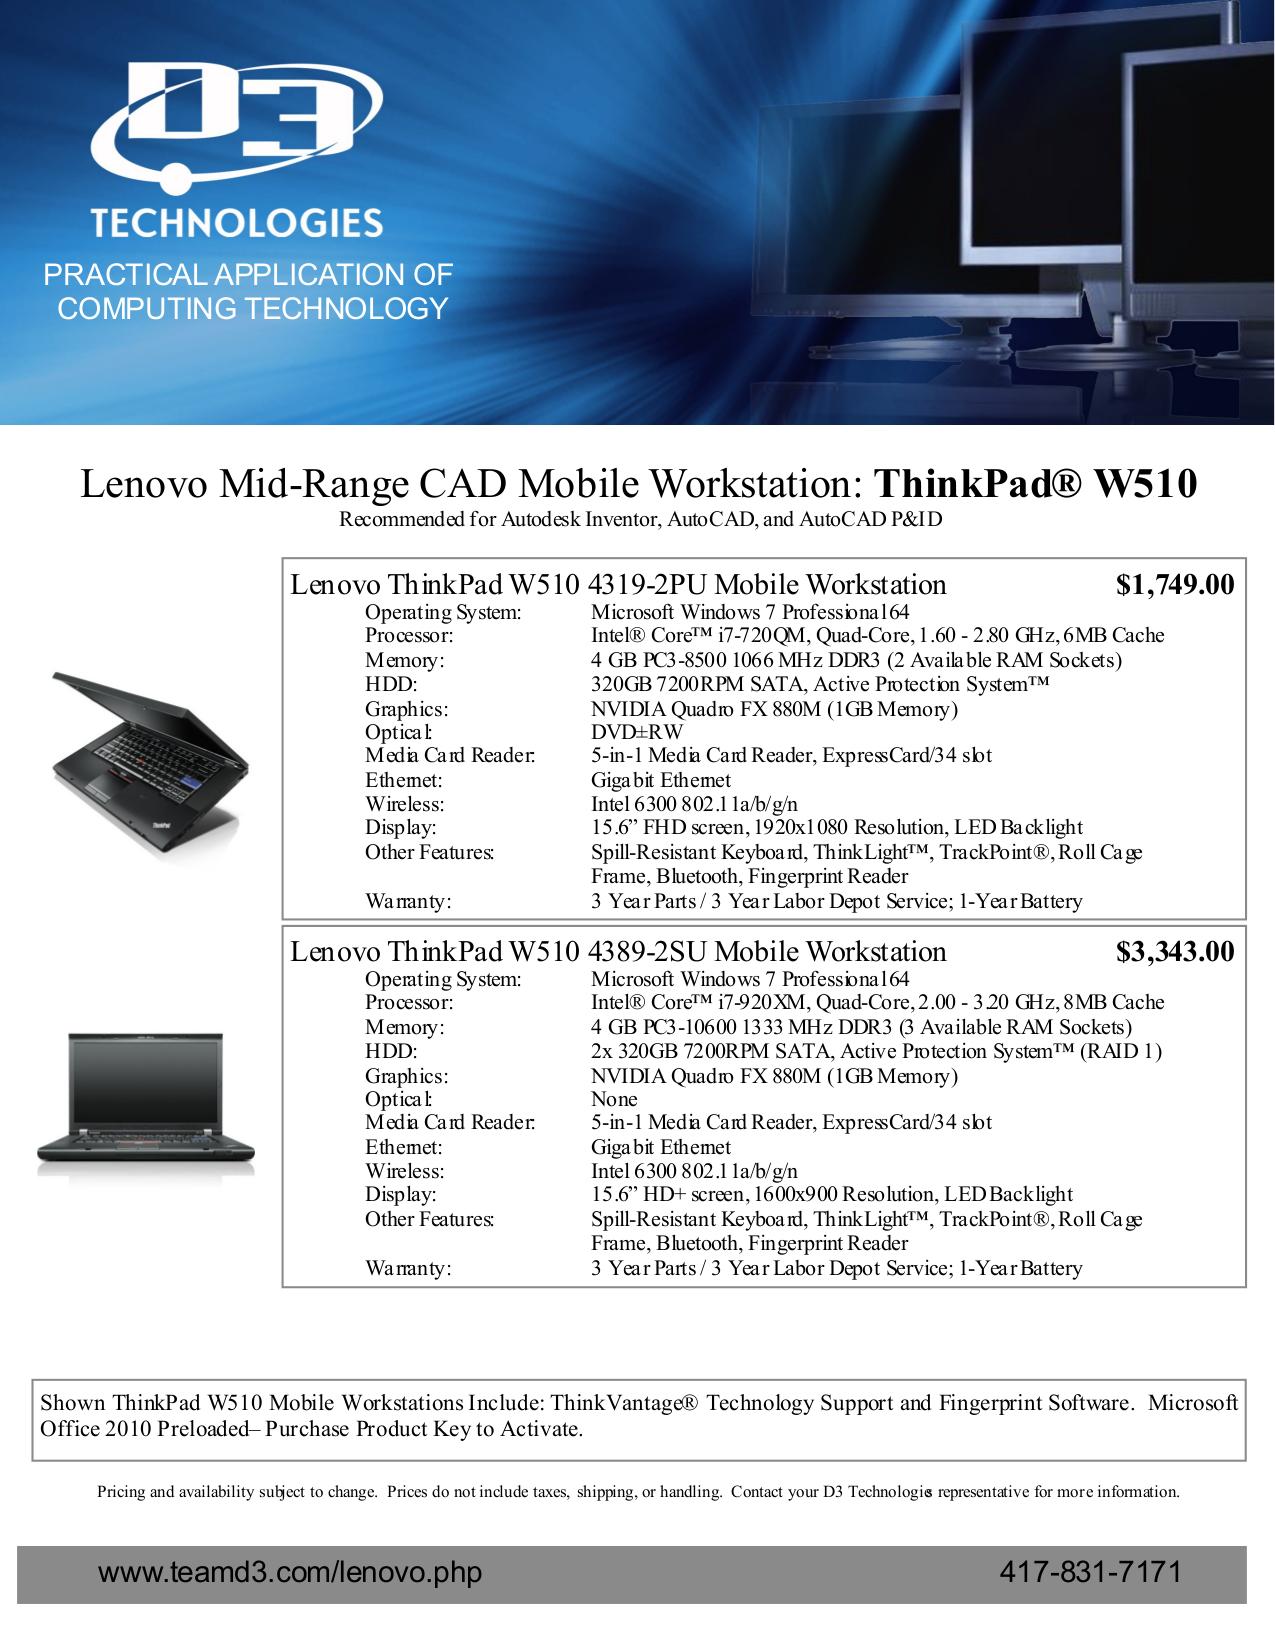 PDF manual for Lenovo Laptop ThinkPad W510 4389